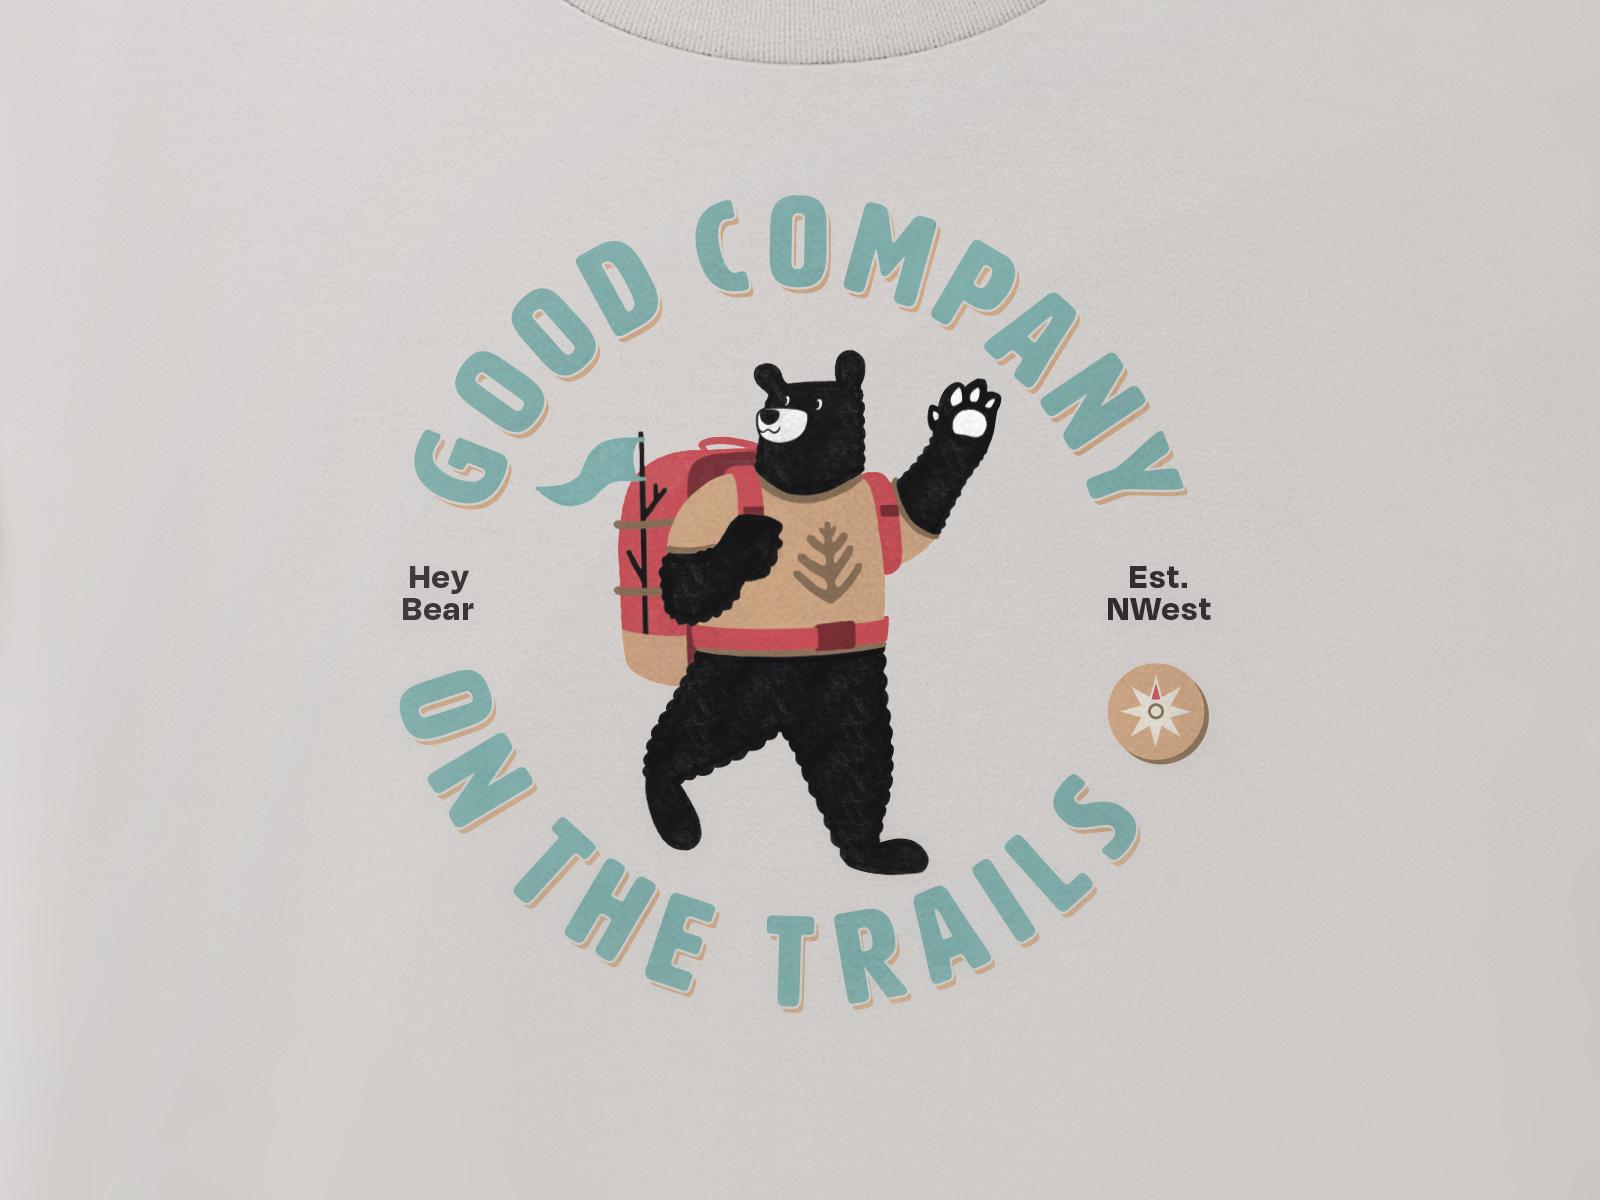 shirt graphic design for hey bear logo design project